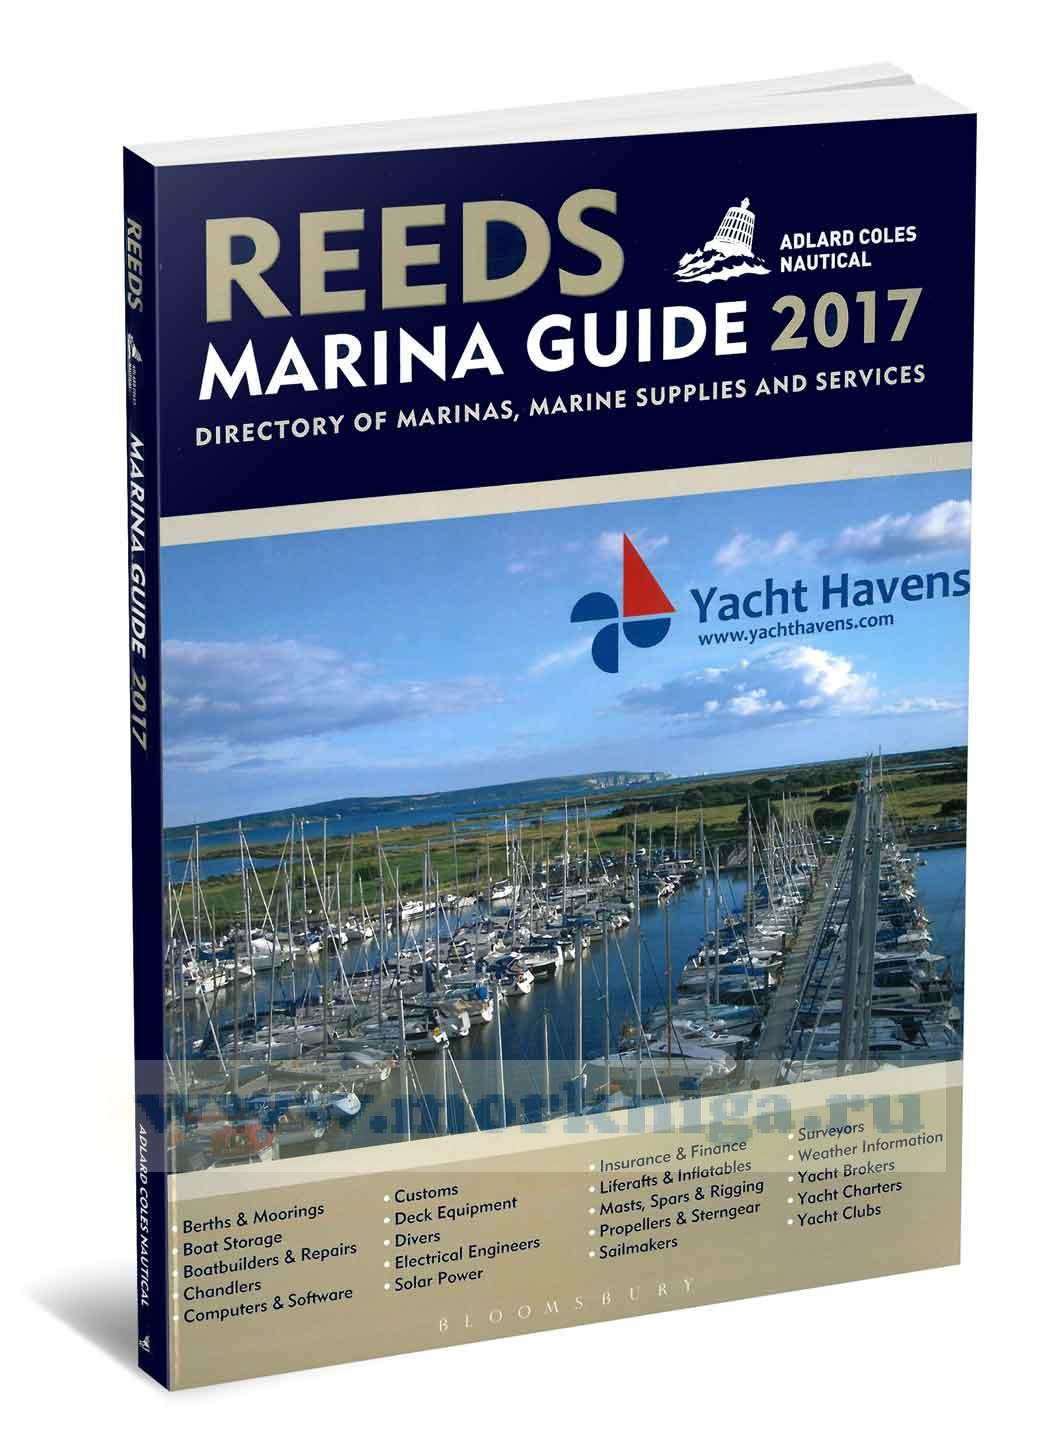 Reeds Marina Guide 2017